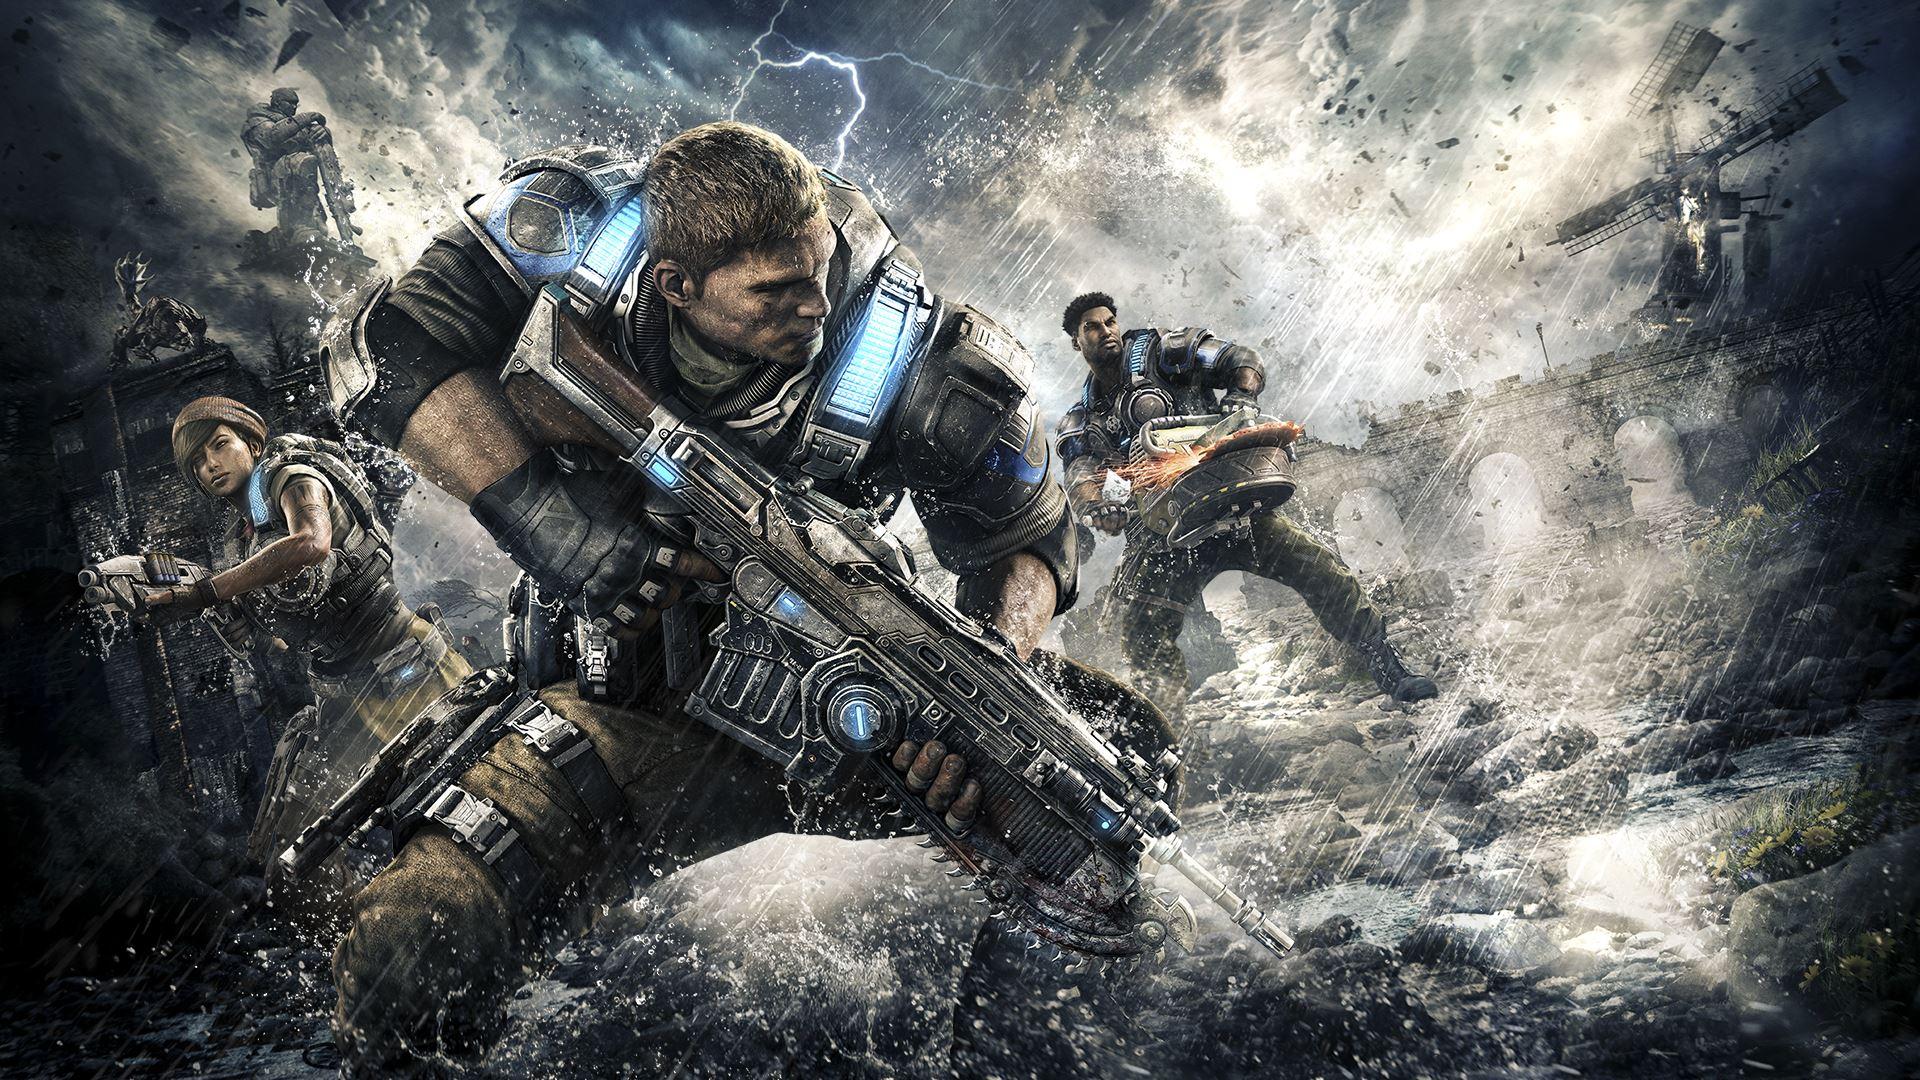 trailer de lancement gears of War 4